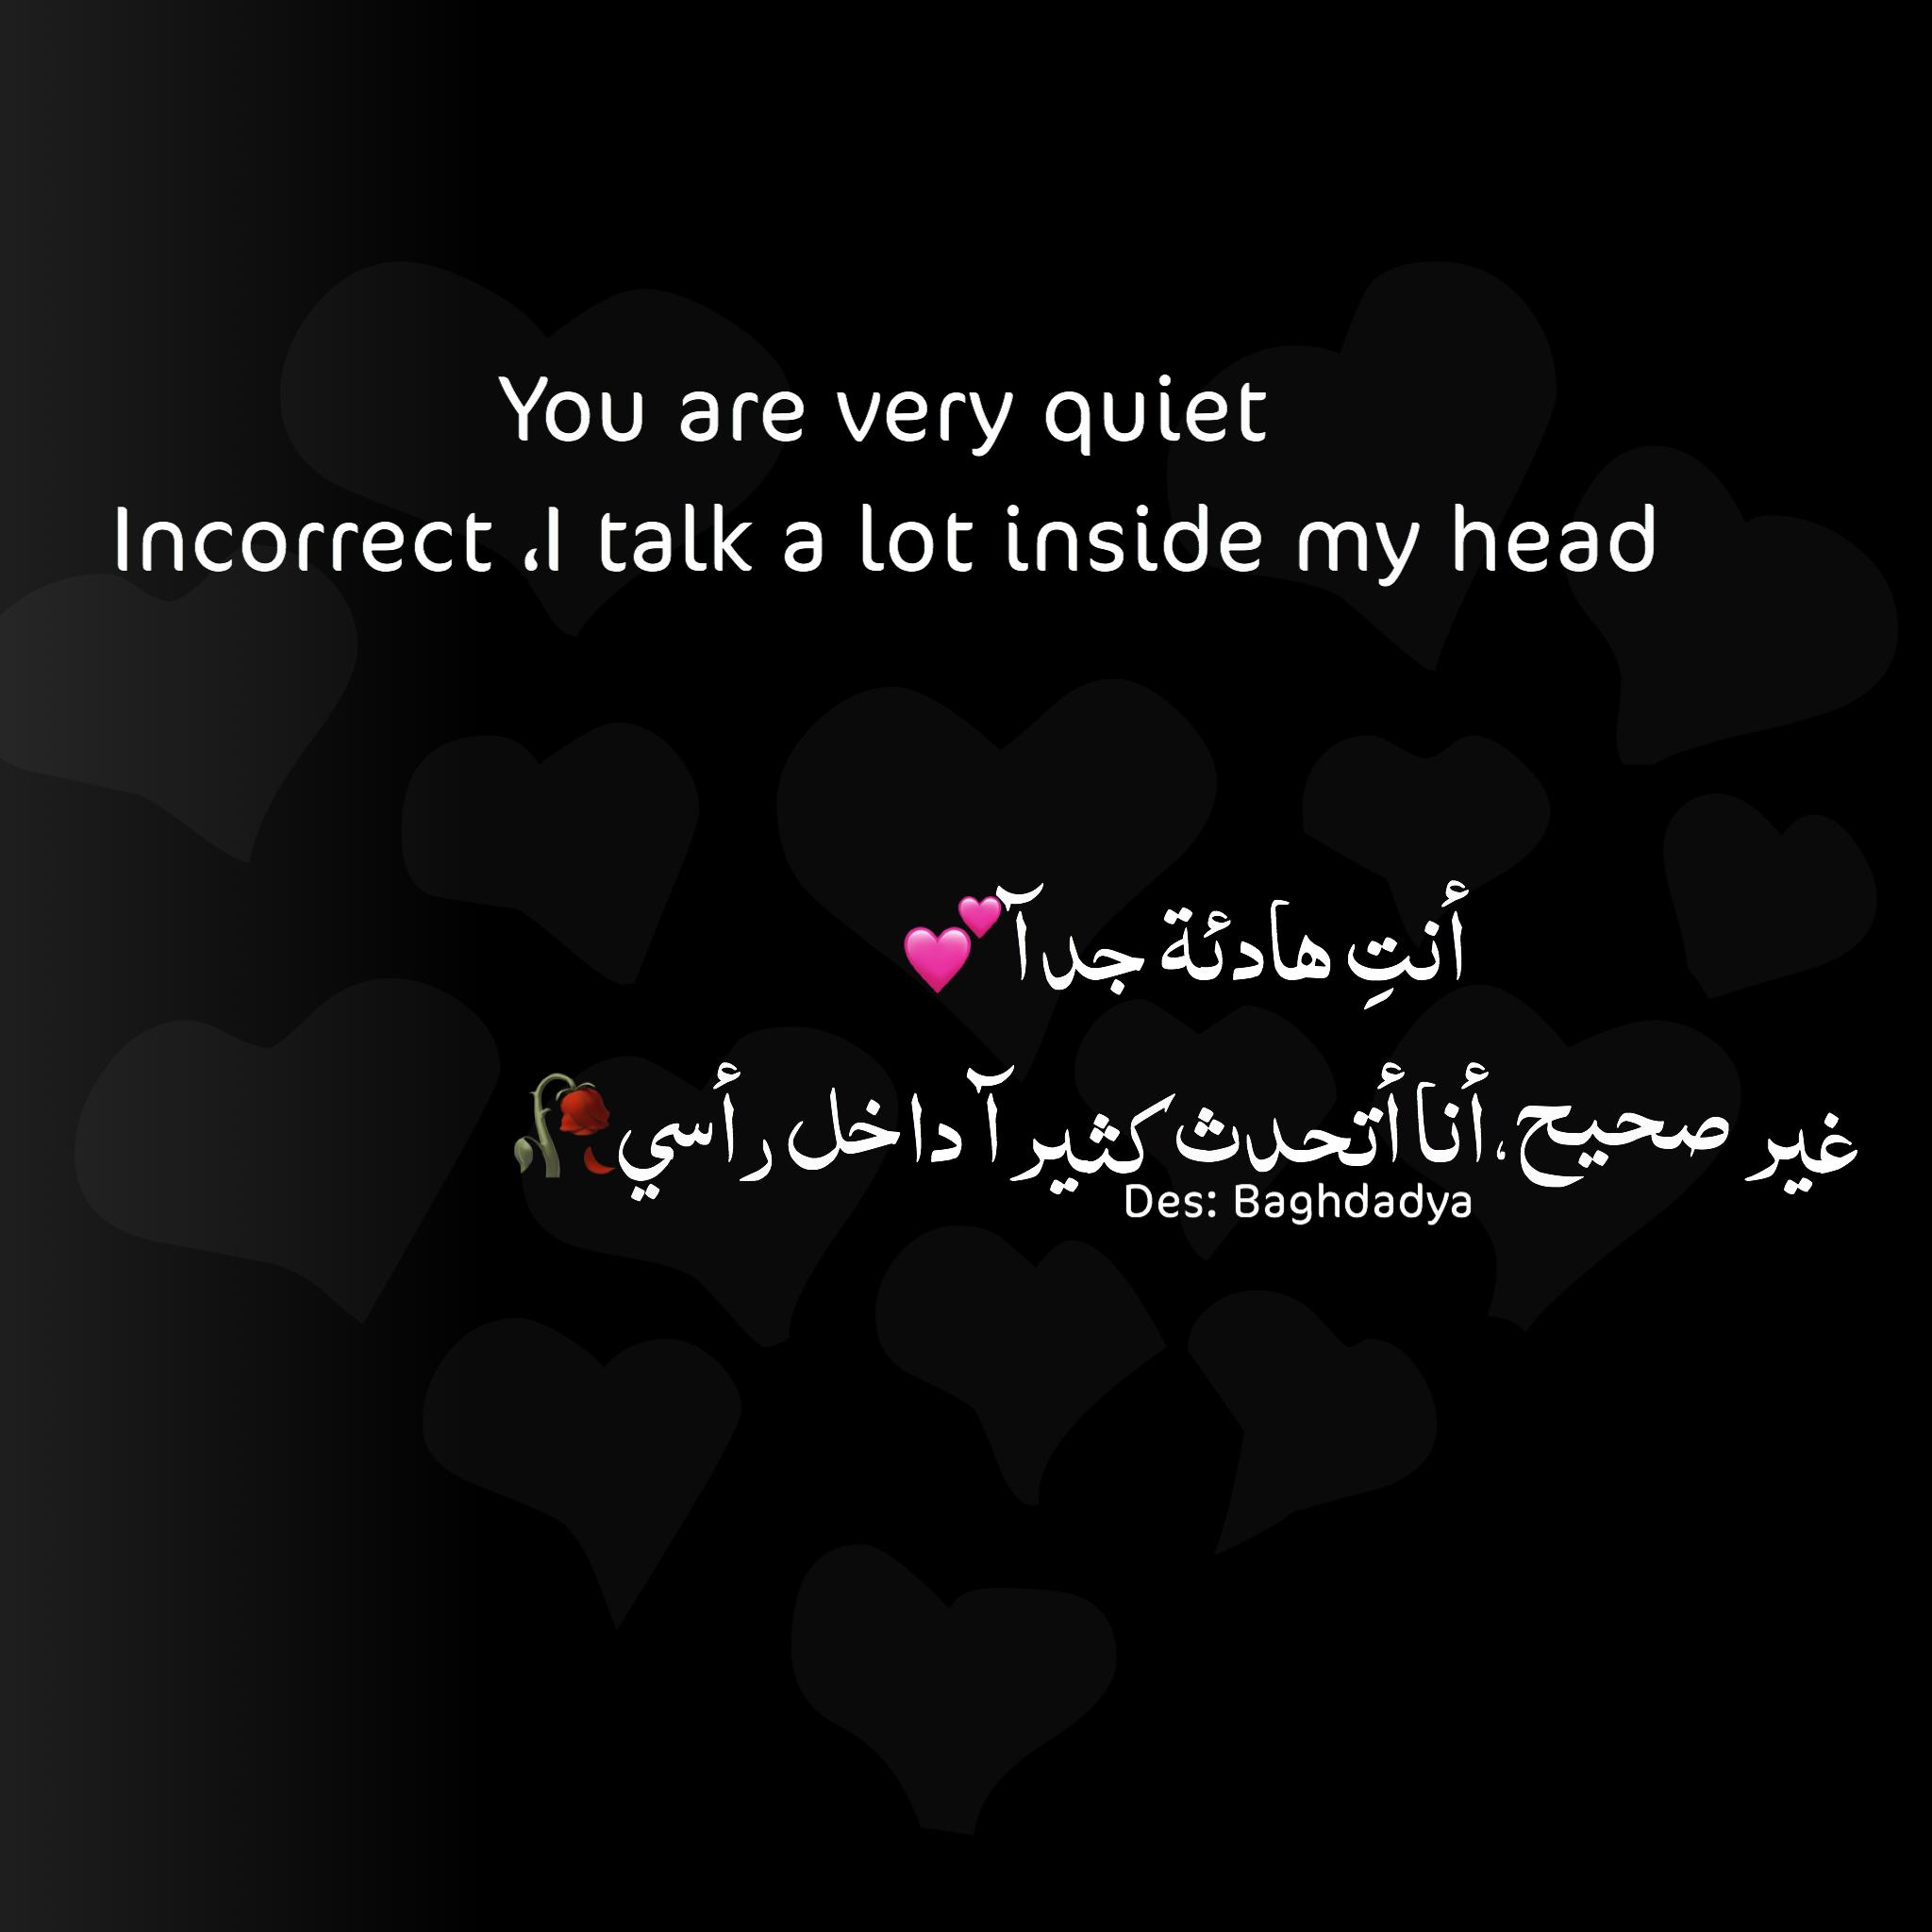 Pin By Fatima Al Doski On رمزيات Arabic Quotes Words Words Of Wisdom